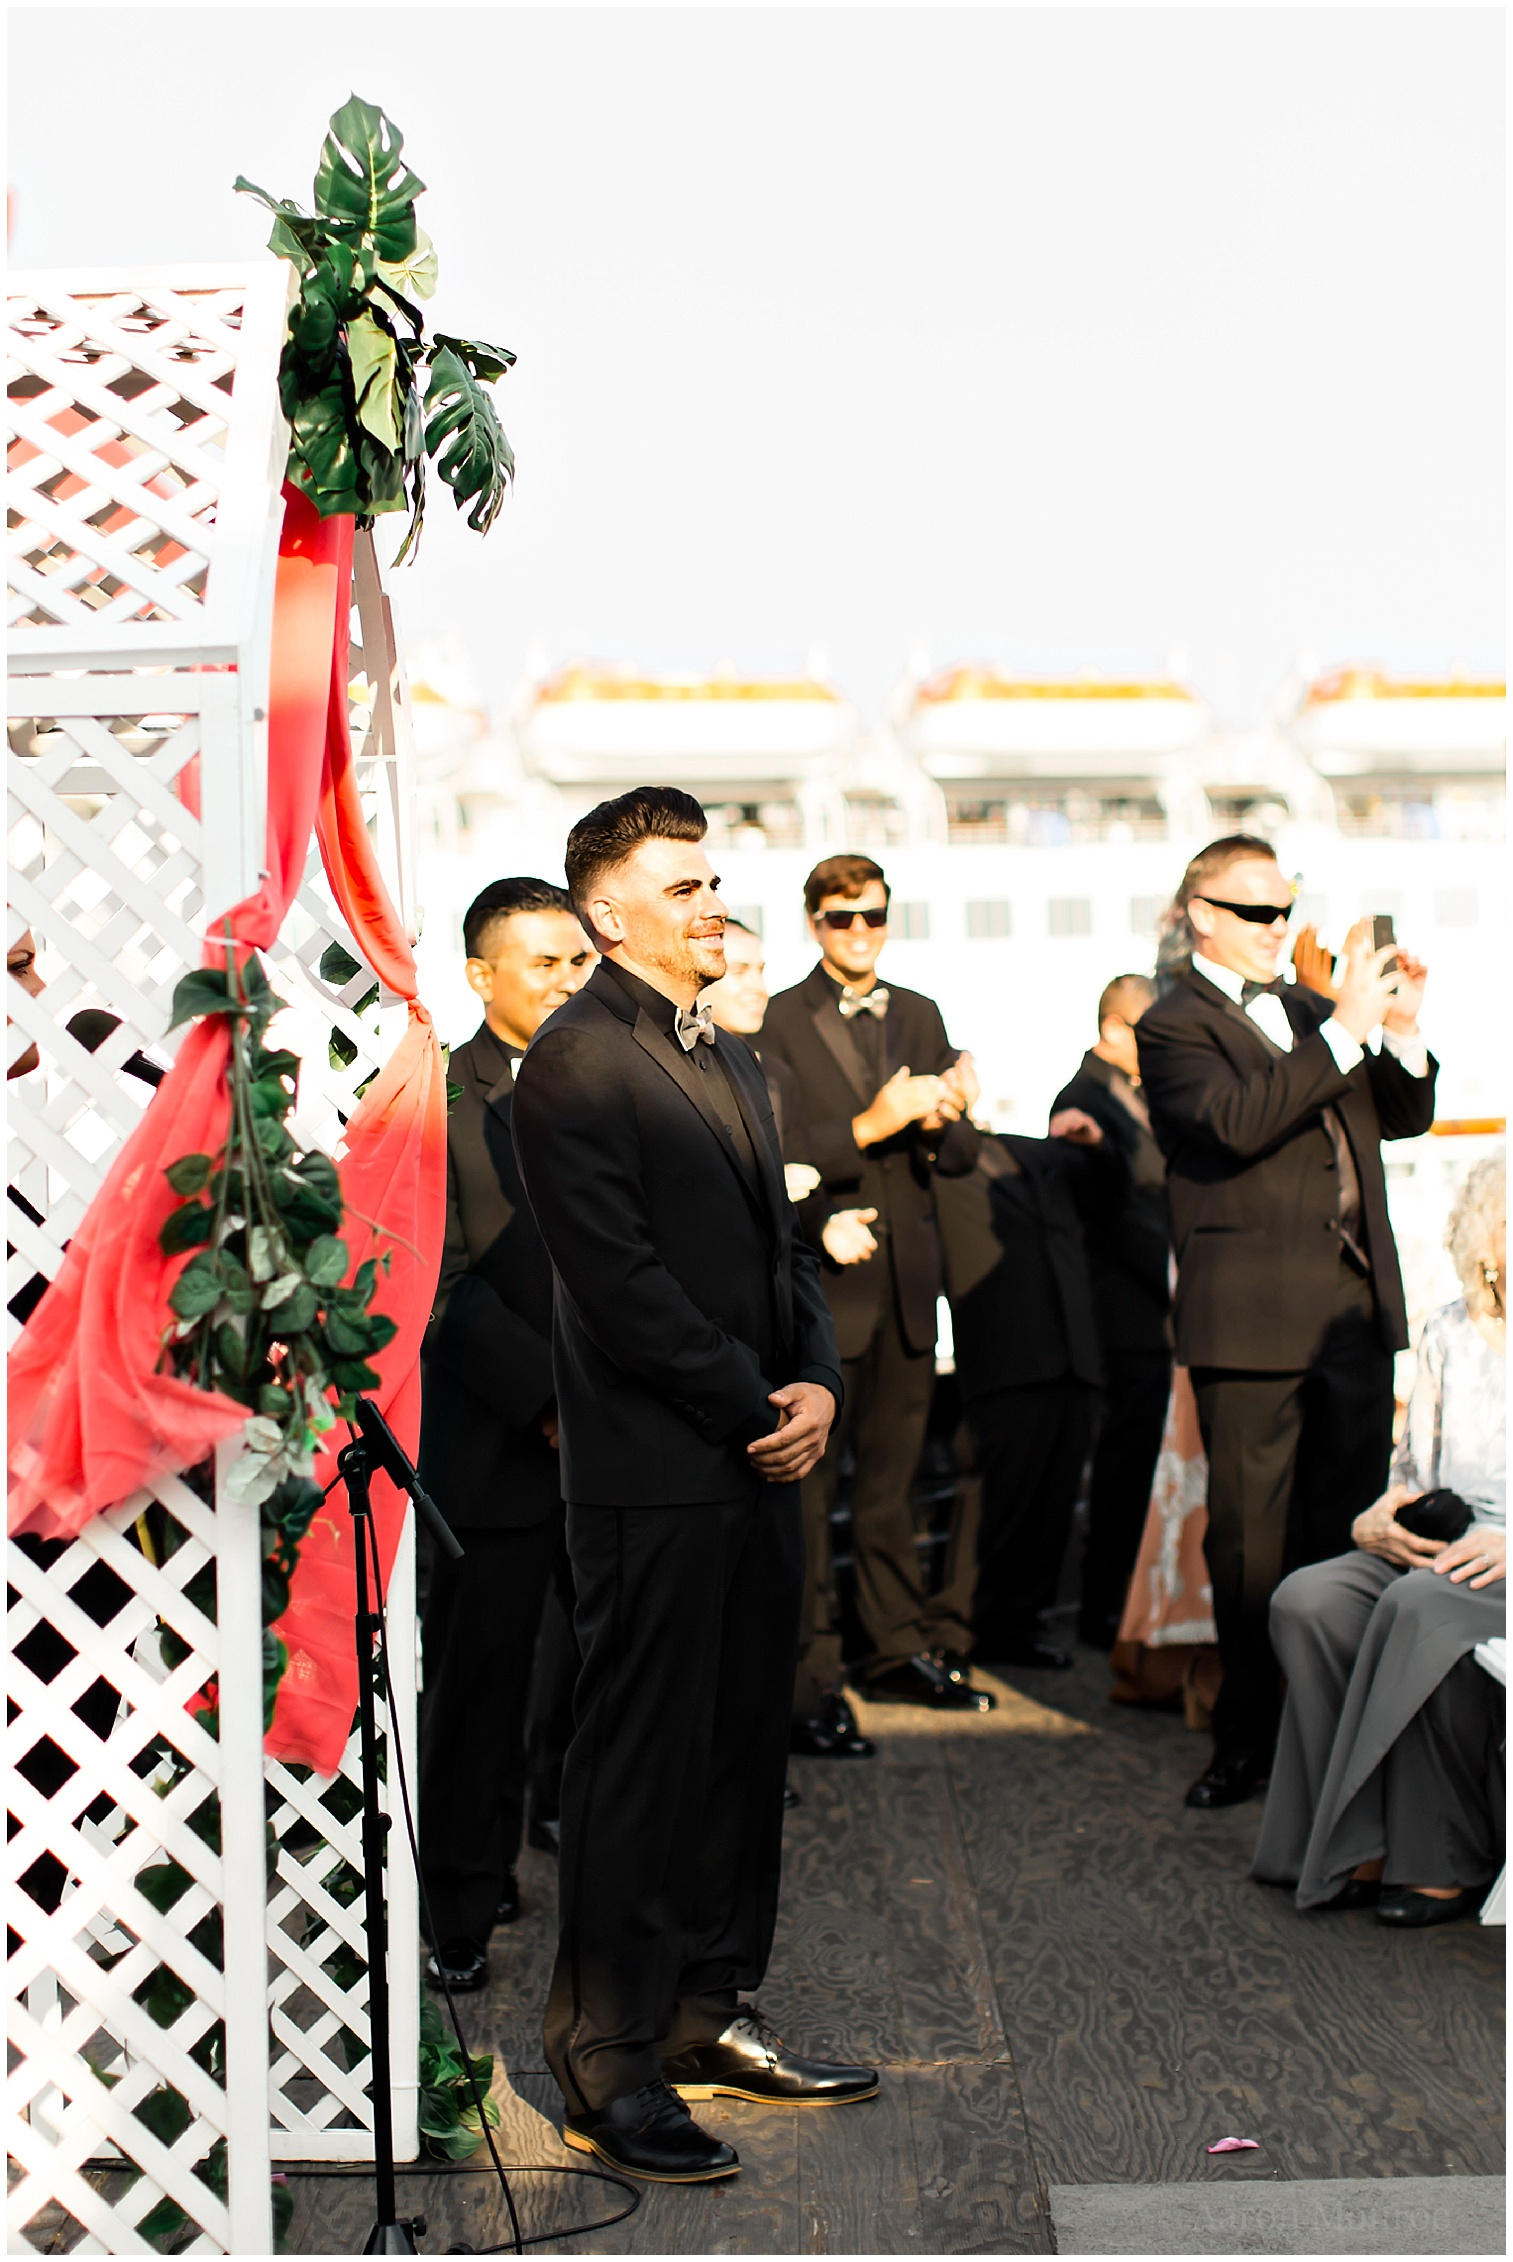 Queen_Mary_Long_Beach_Wedding_Photography_0459.jpg